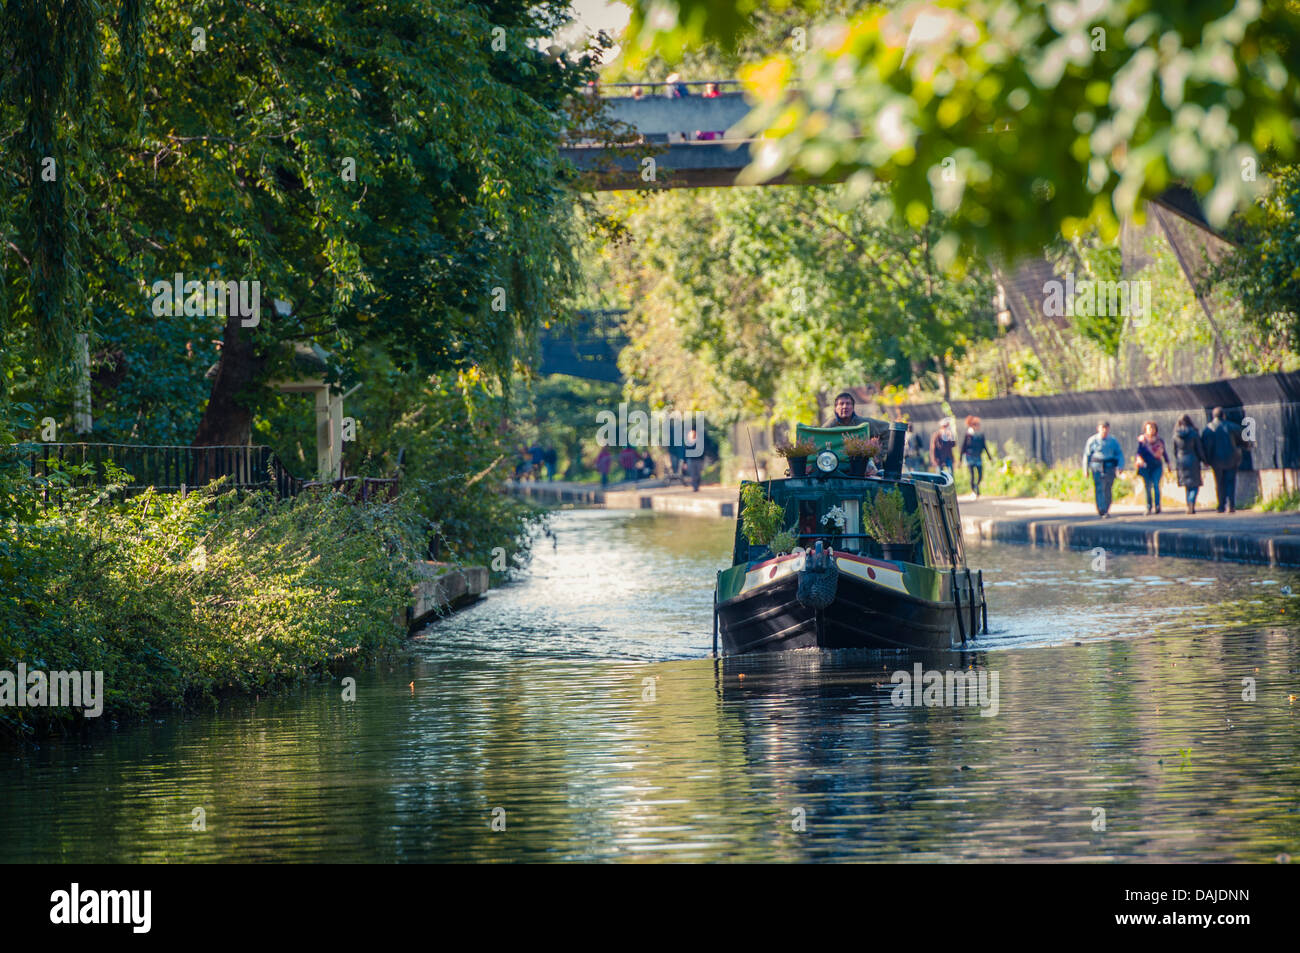 Longboat on Regent's canal, London - Stock Image